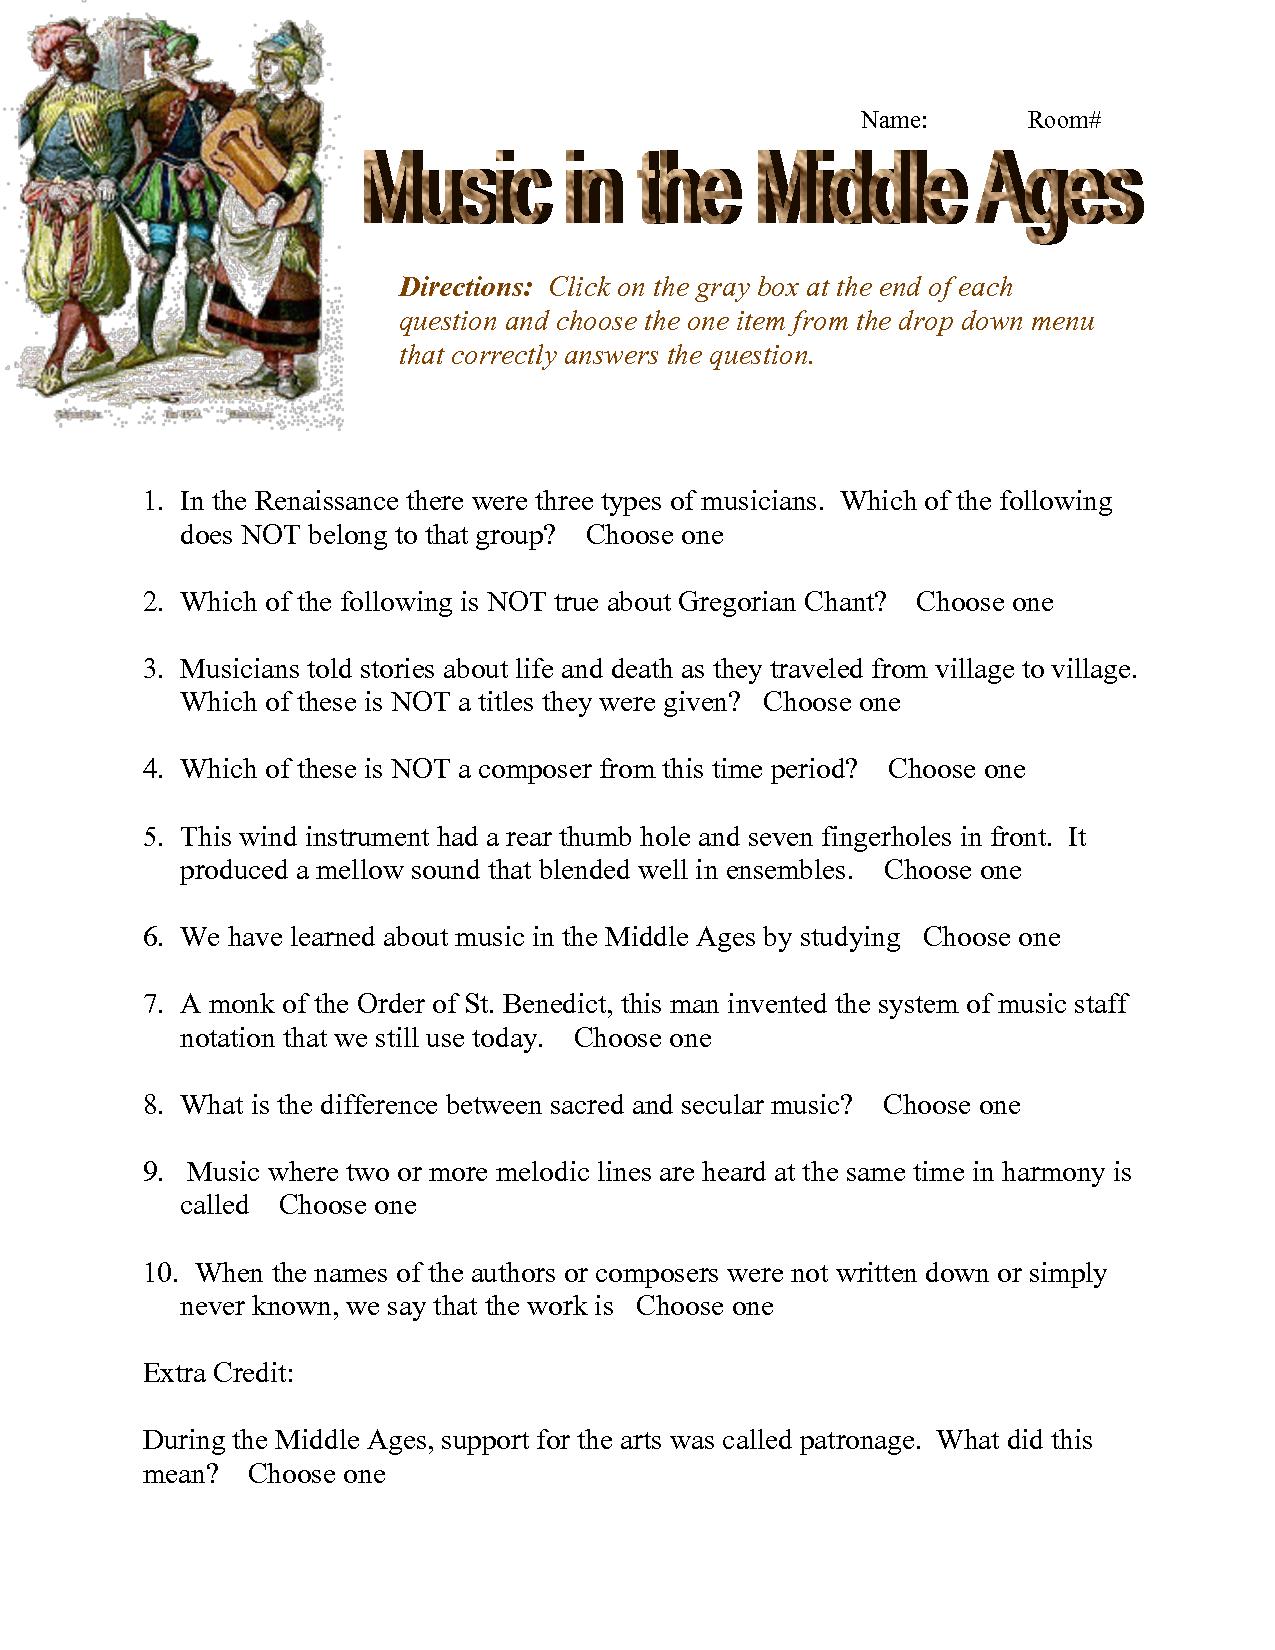 middle+ages+for+kids+worksheets | Middle Ages Worksheet - DOC ...